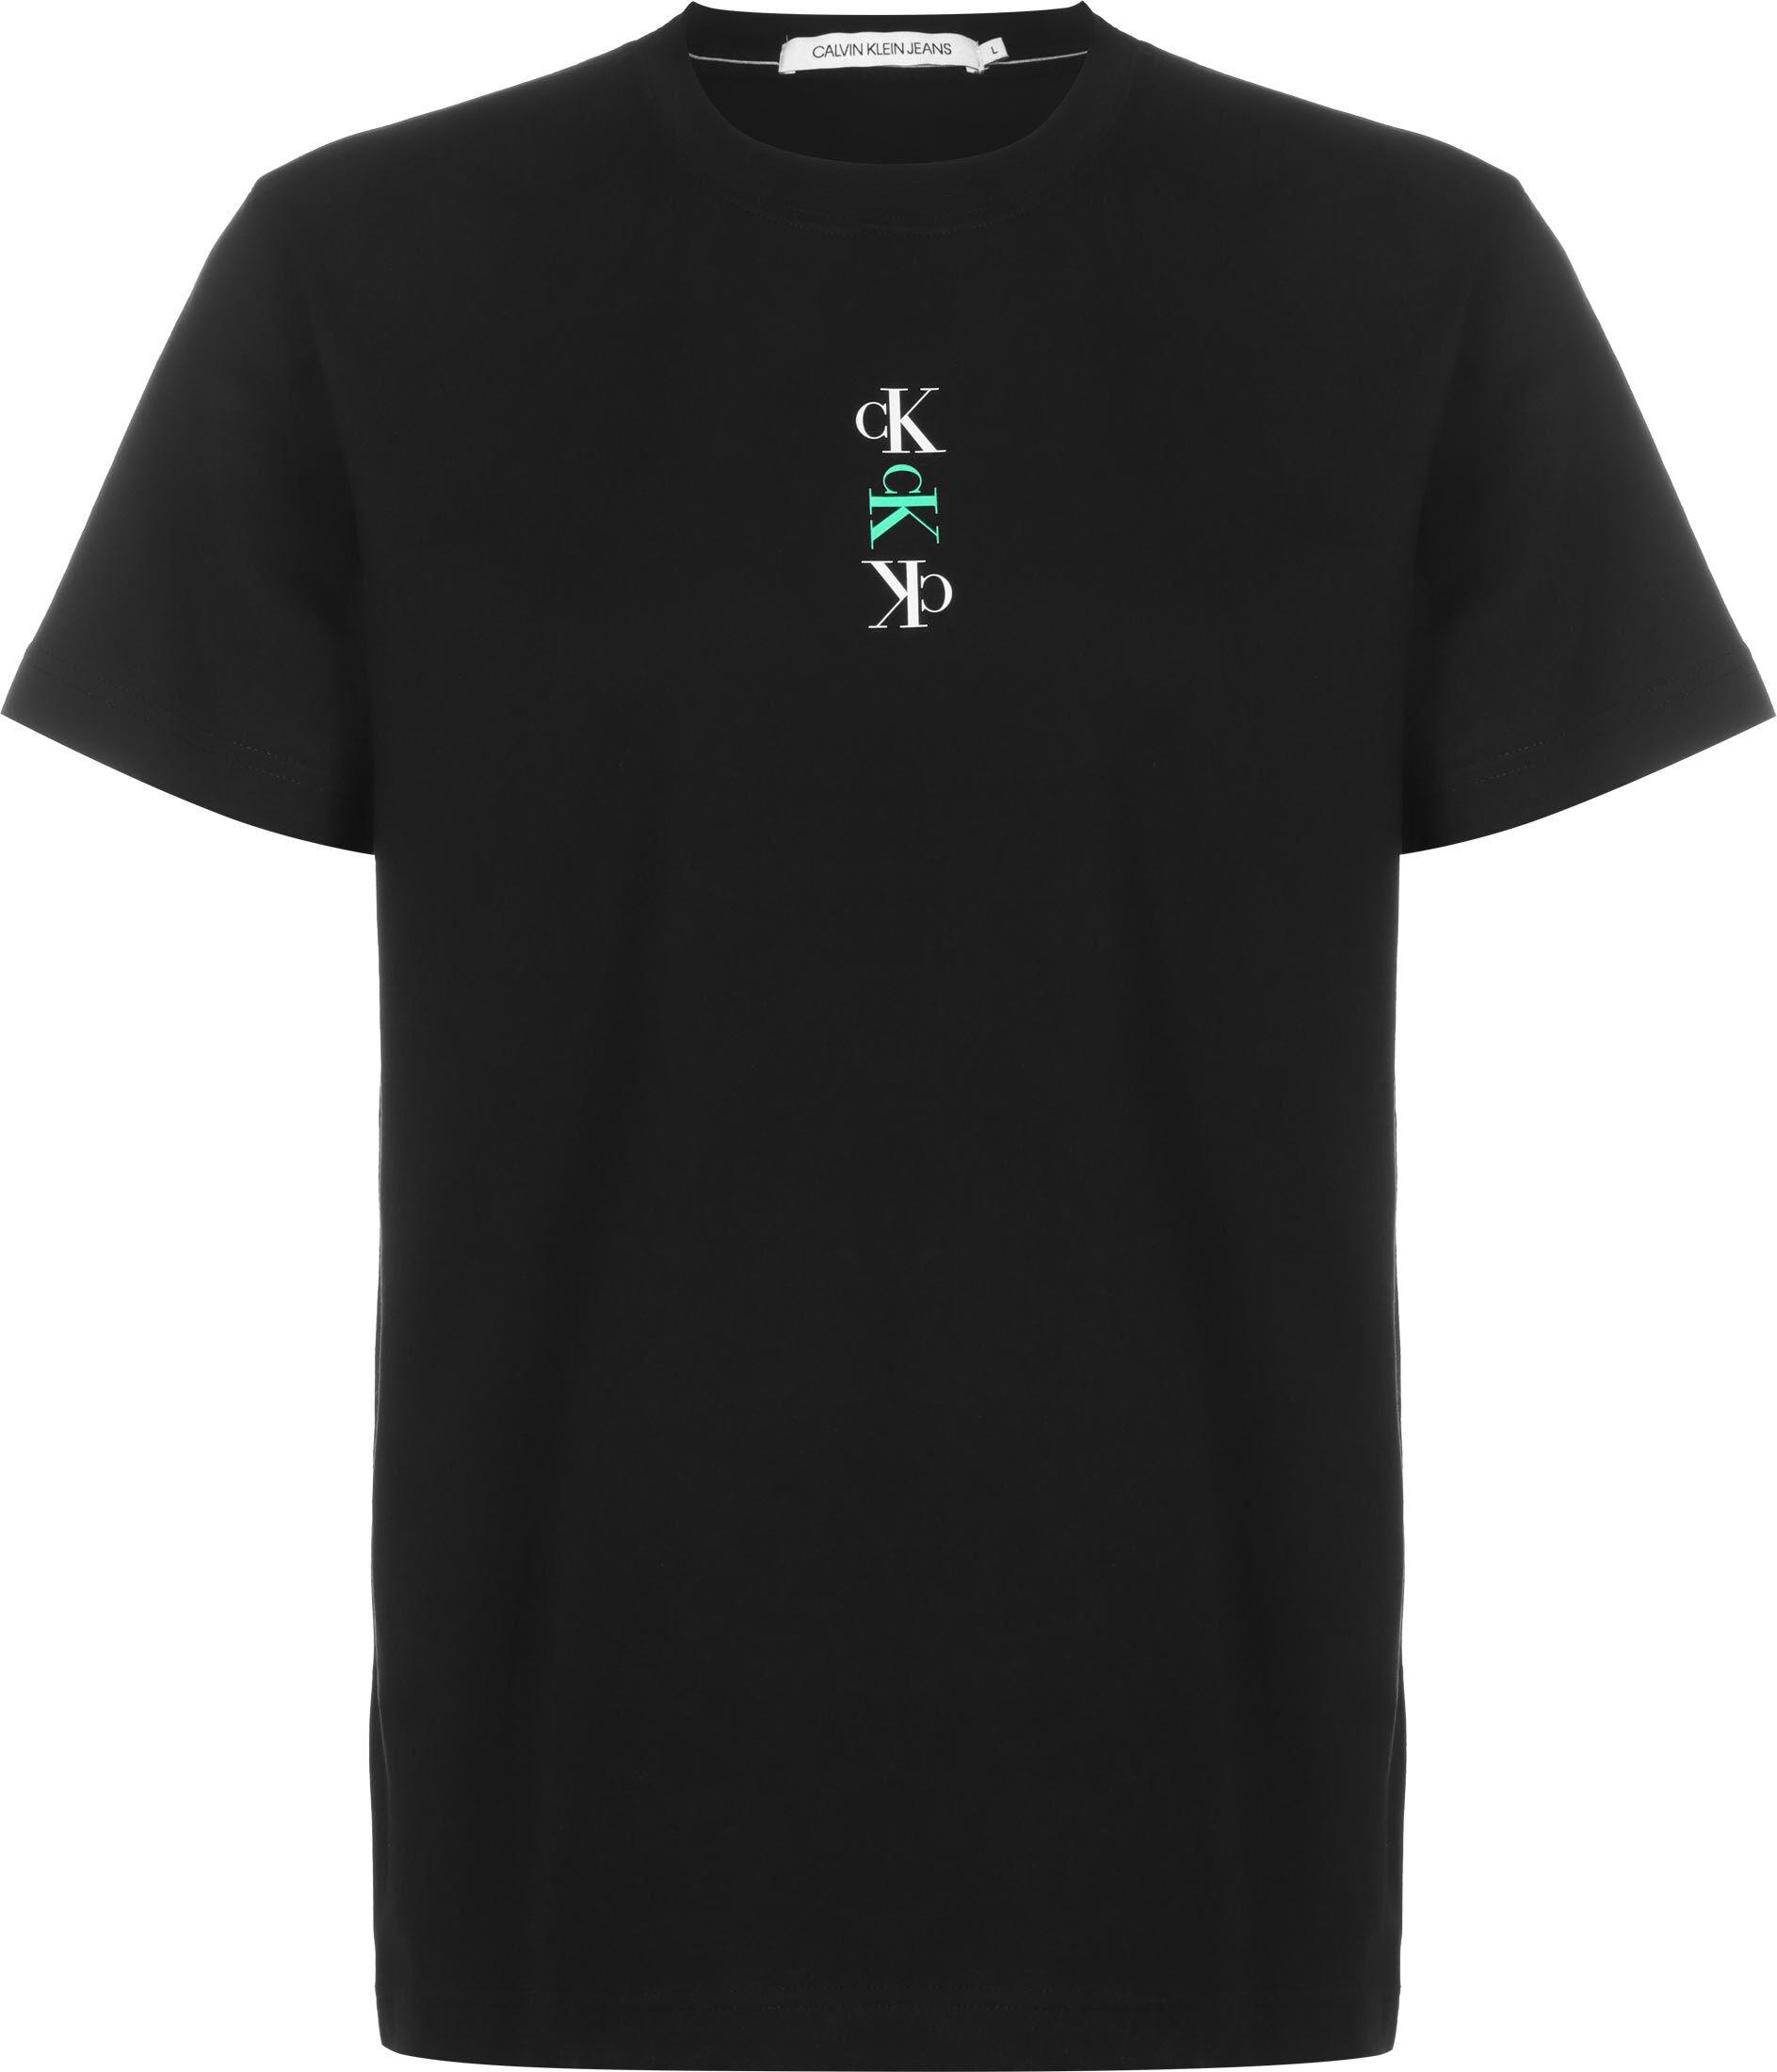 Calvin Klein Jeans Calvin Klein Repeat Graphic Text, taille XL, homme, noir